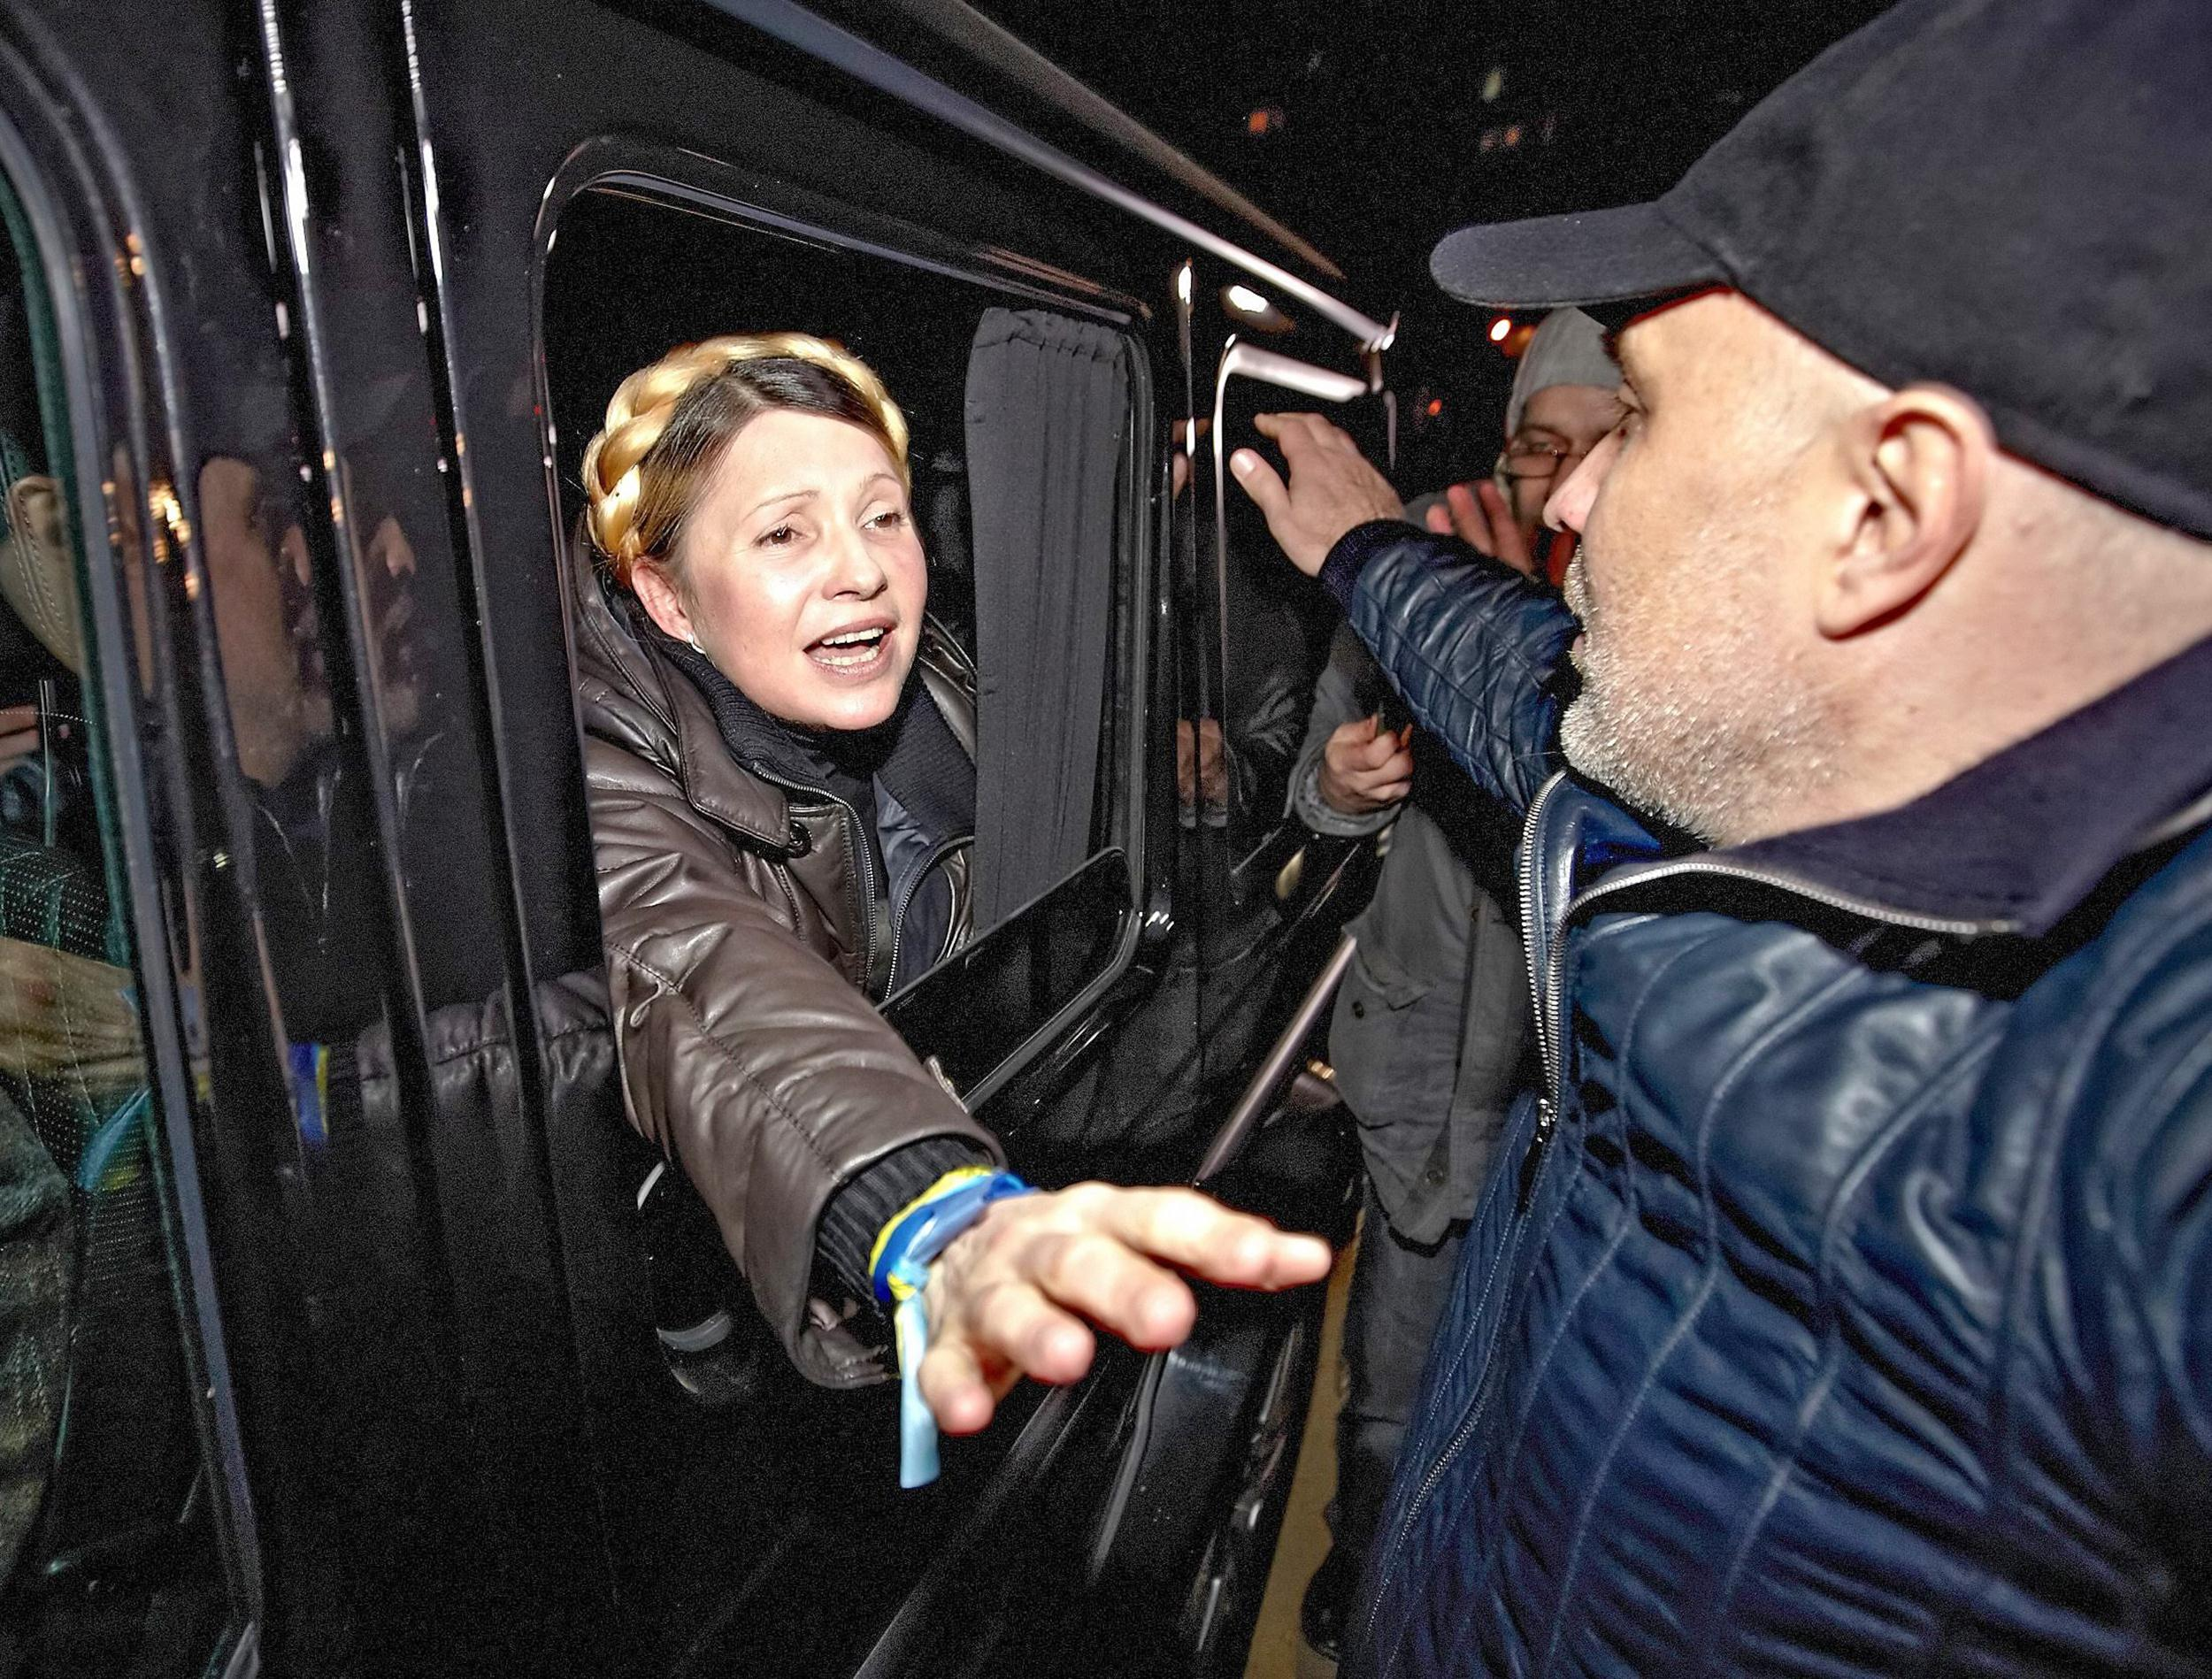 Image: Yulia Tymoshenko freed, leaving hospital